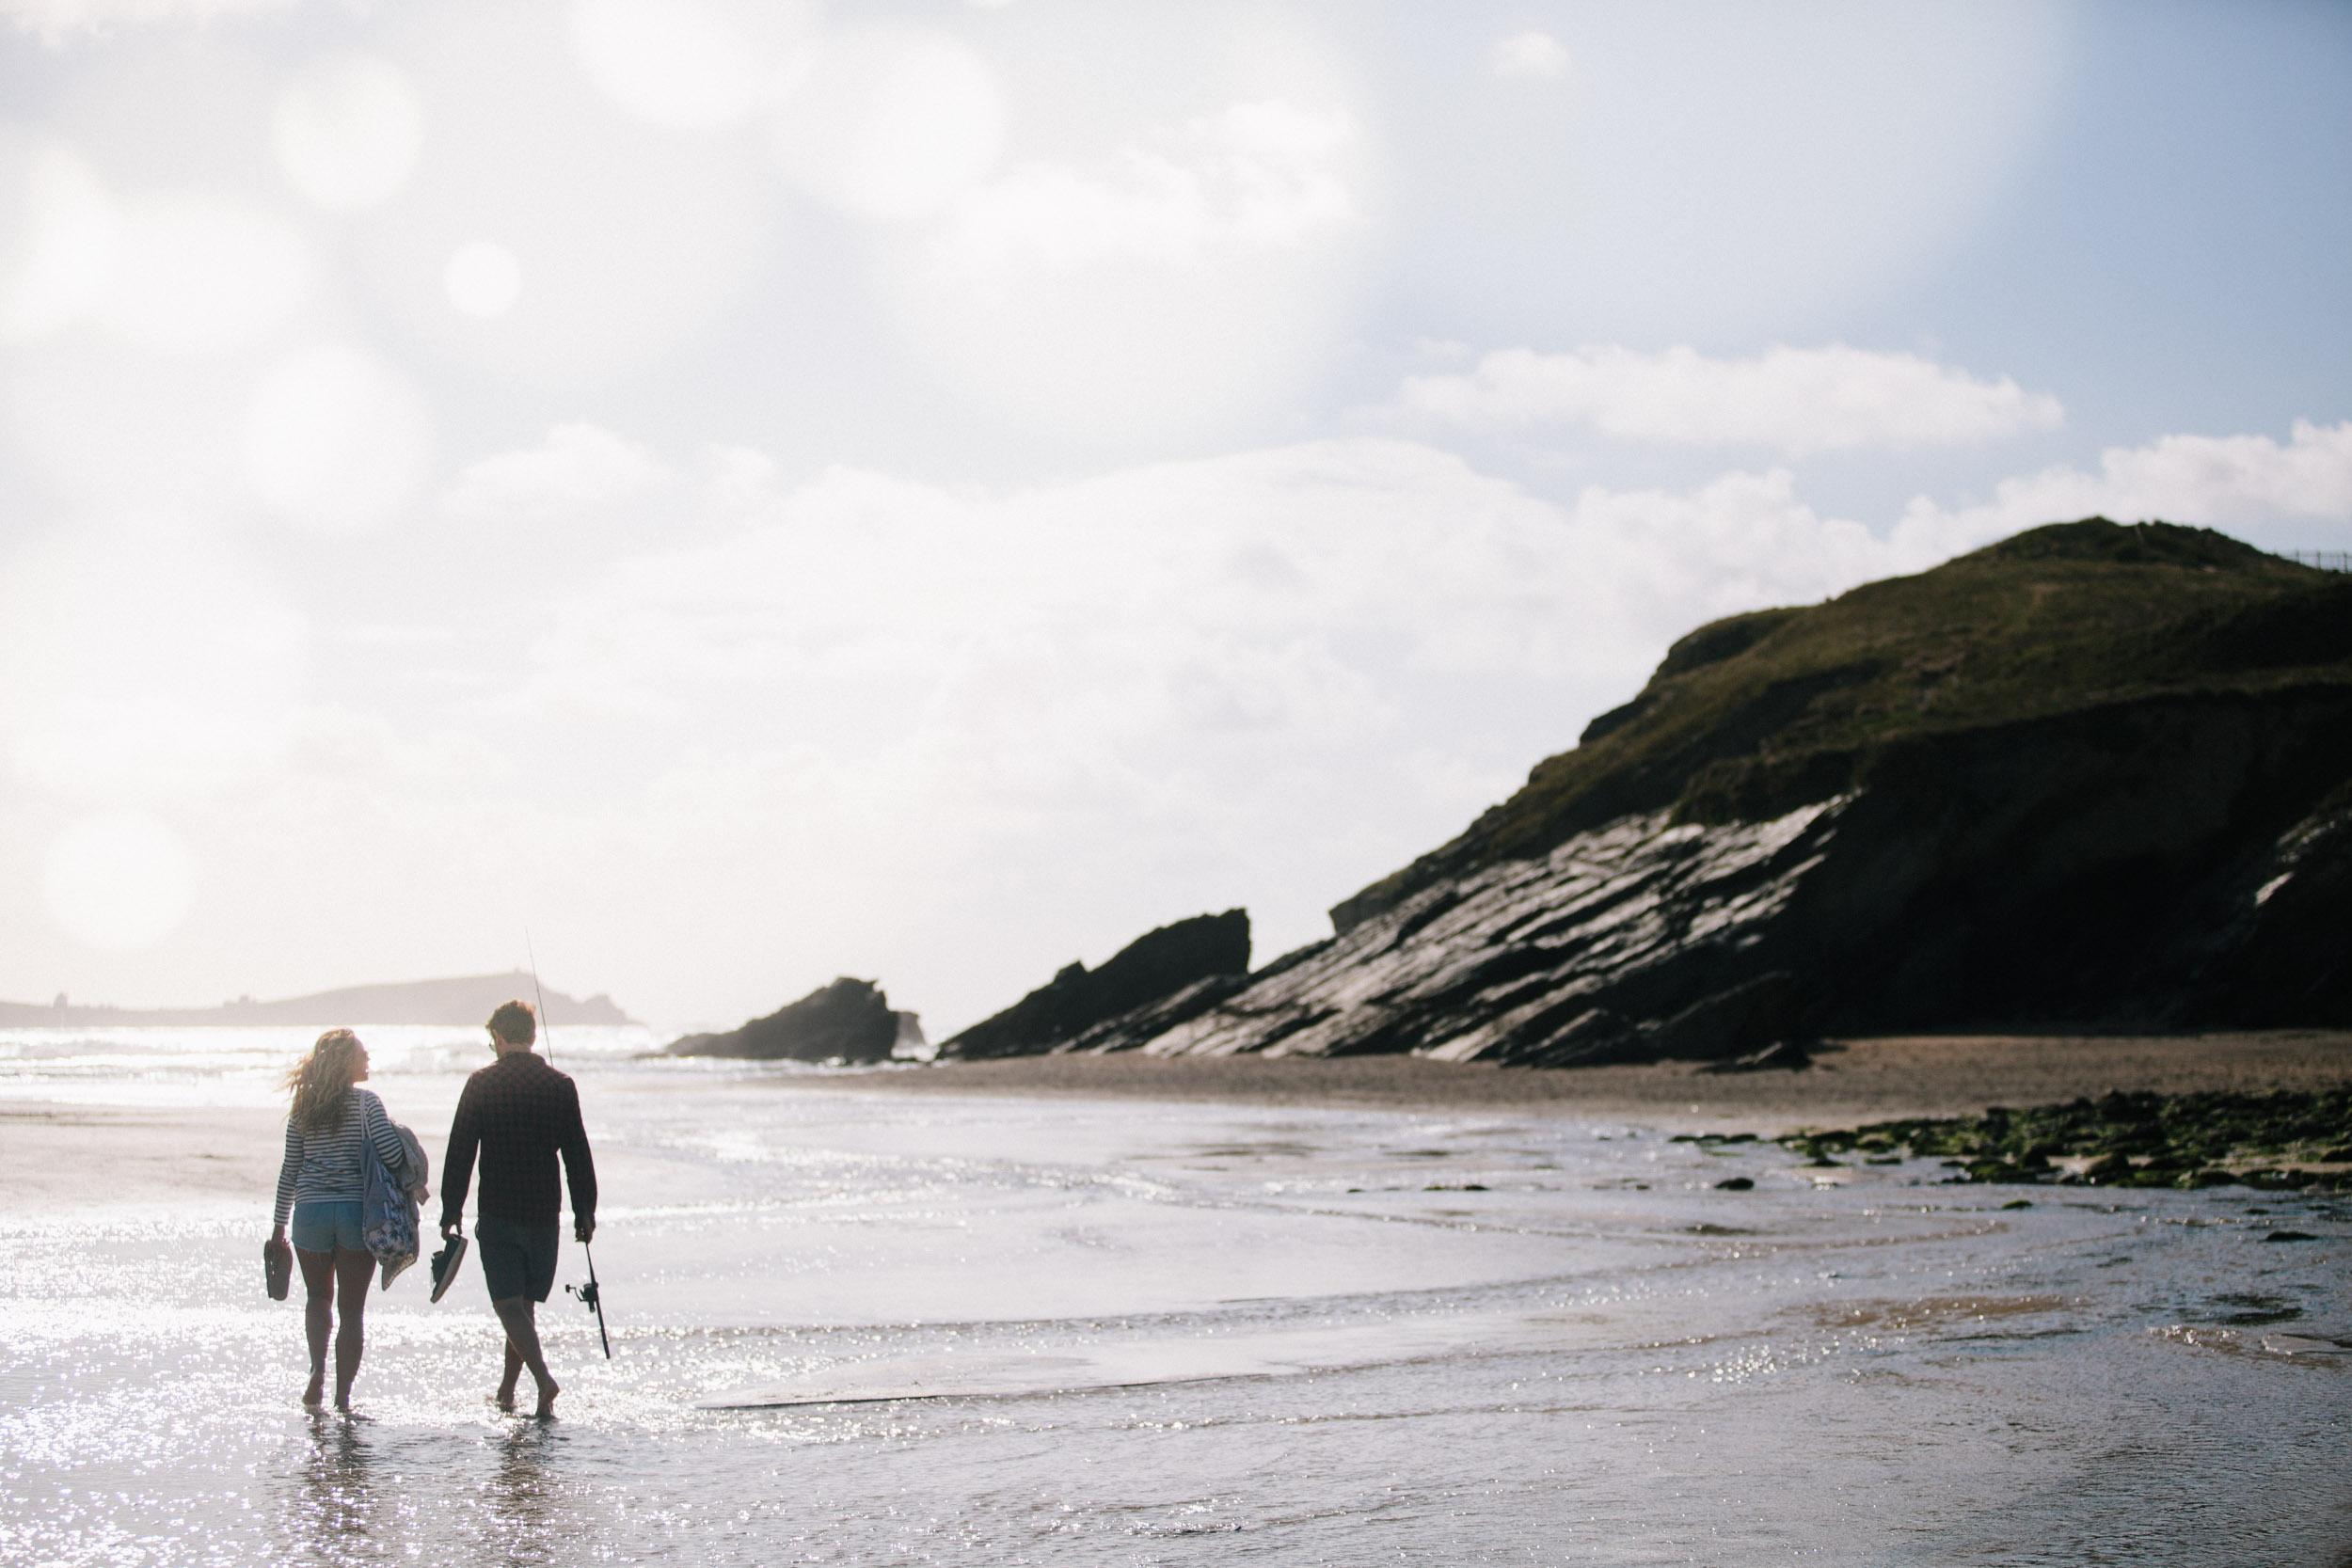 beach-retreats-cornwall-2017-26